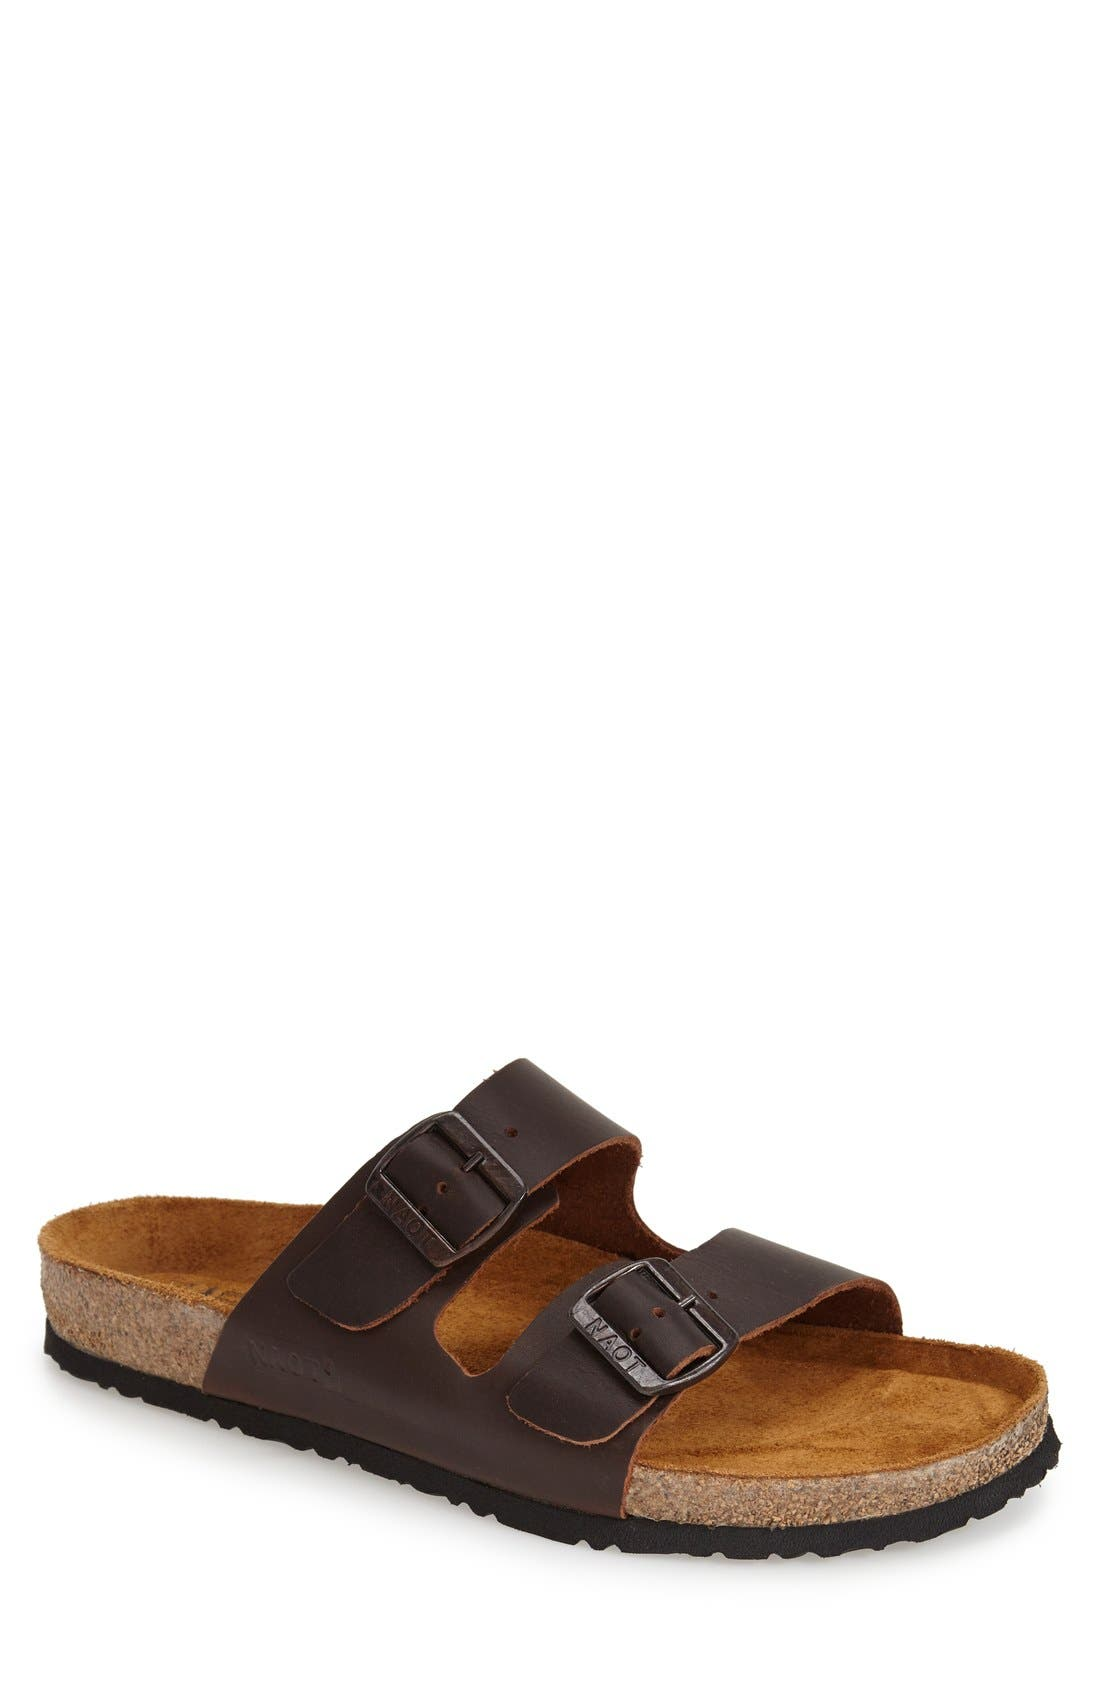 Main Image - Naot Santa Barbara Slide Sandal (Men)